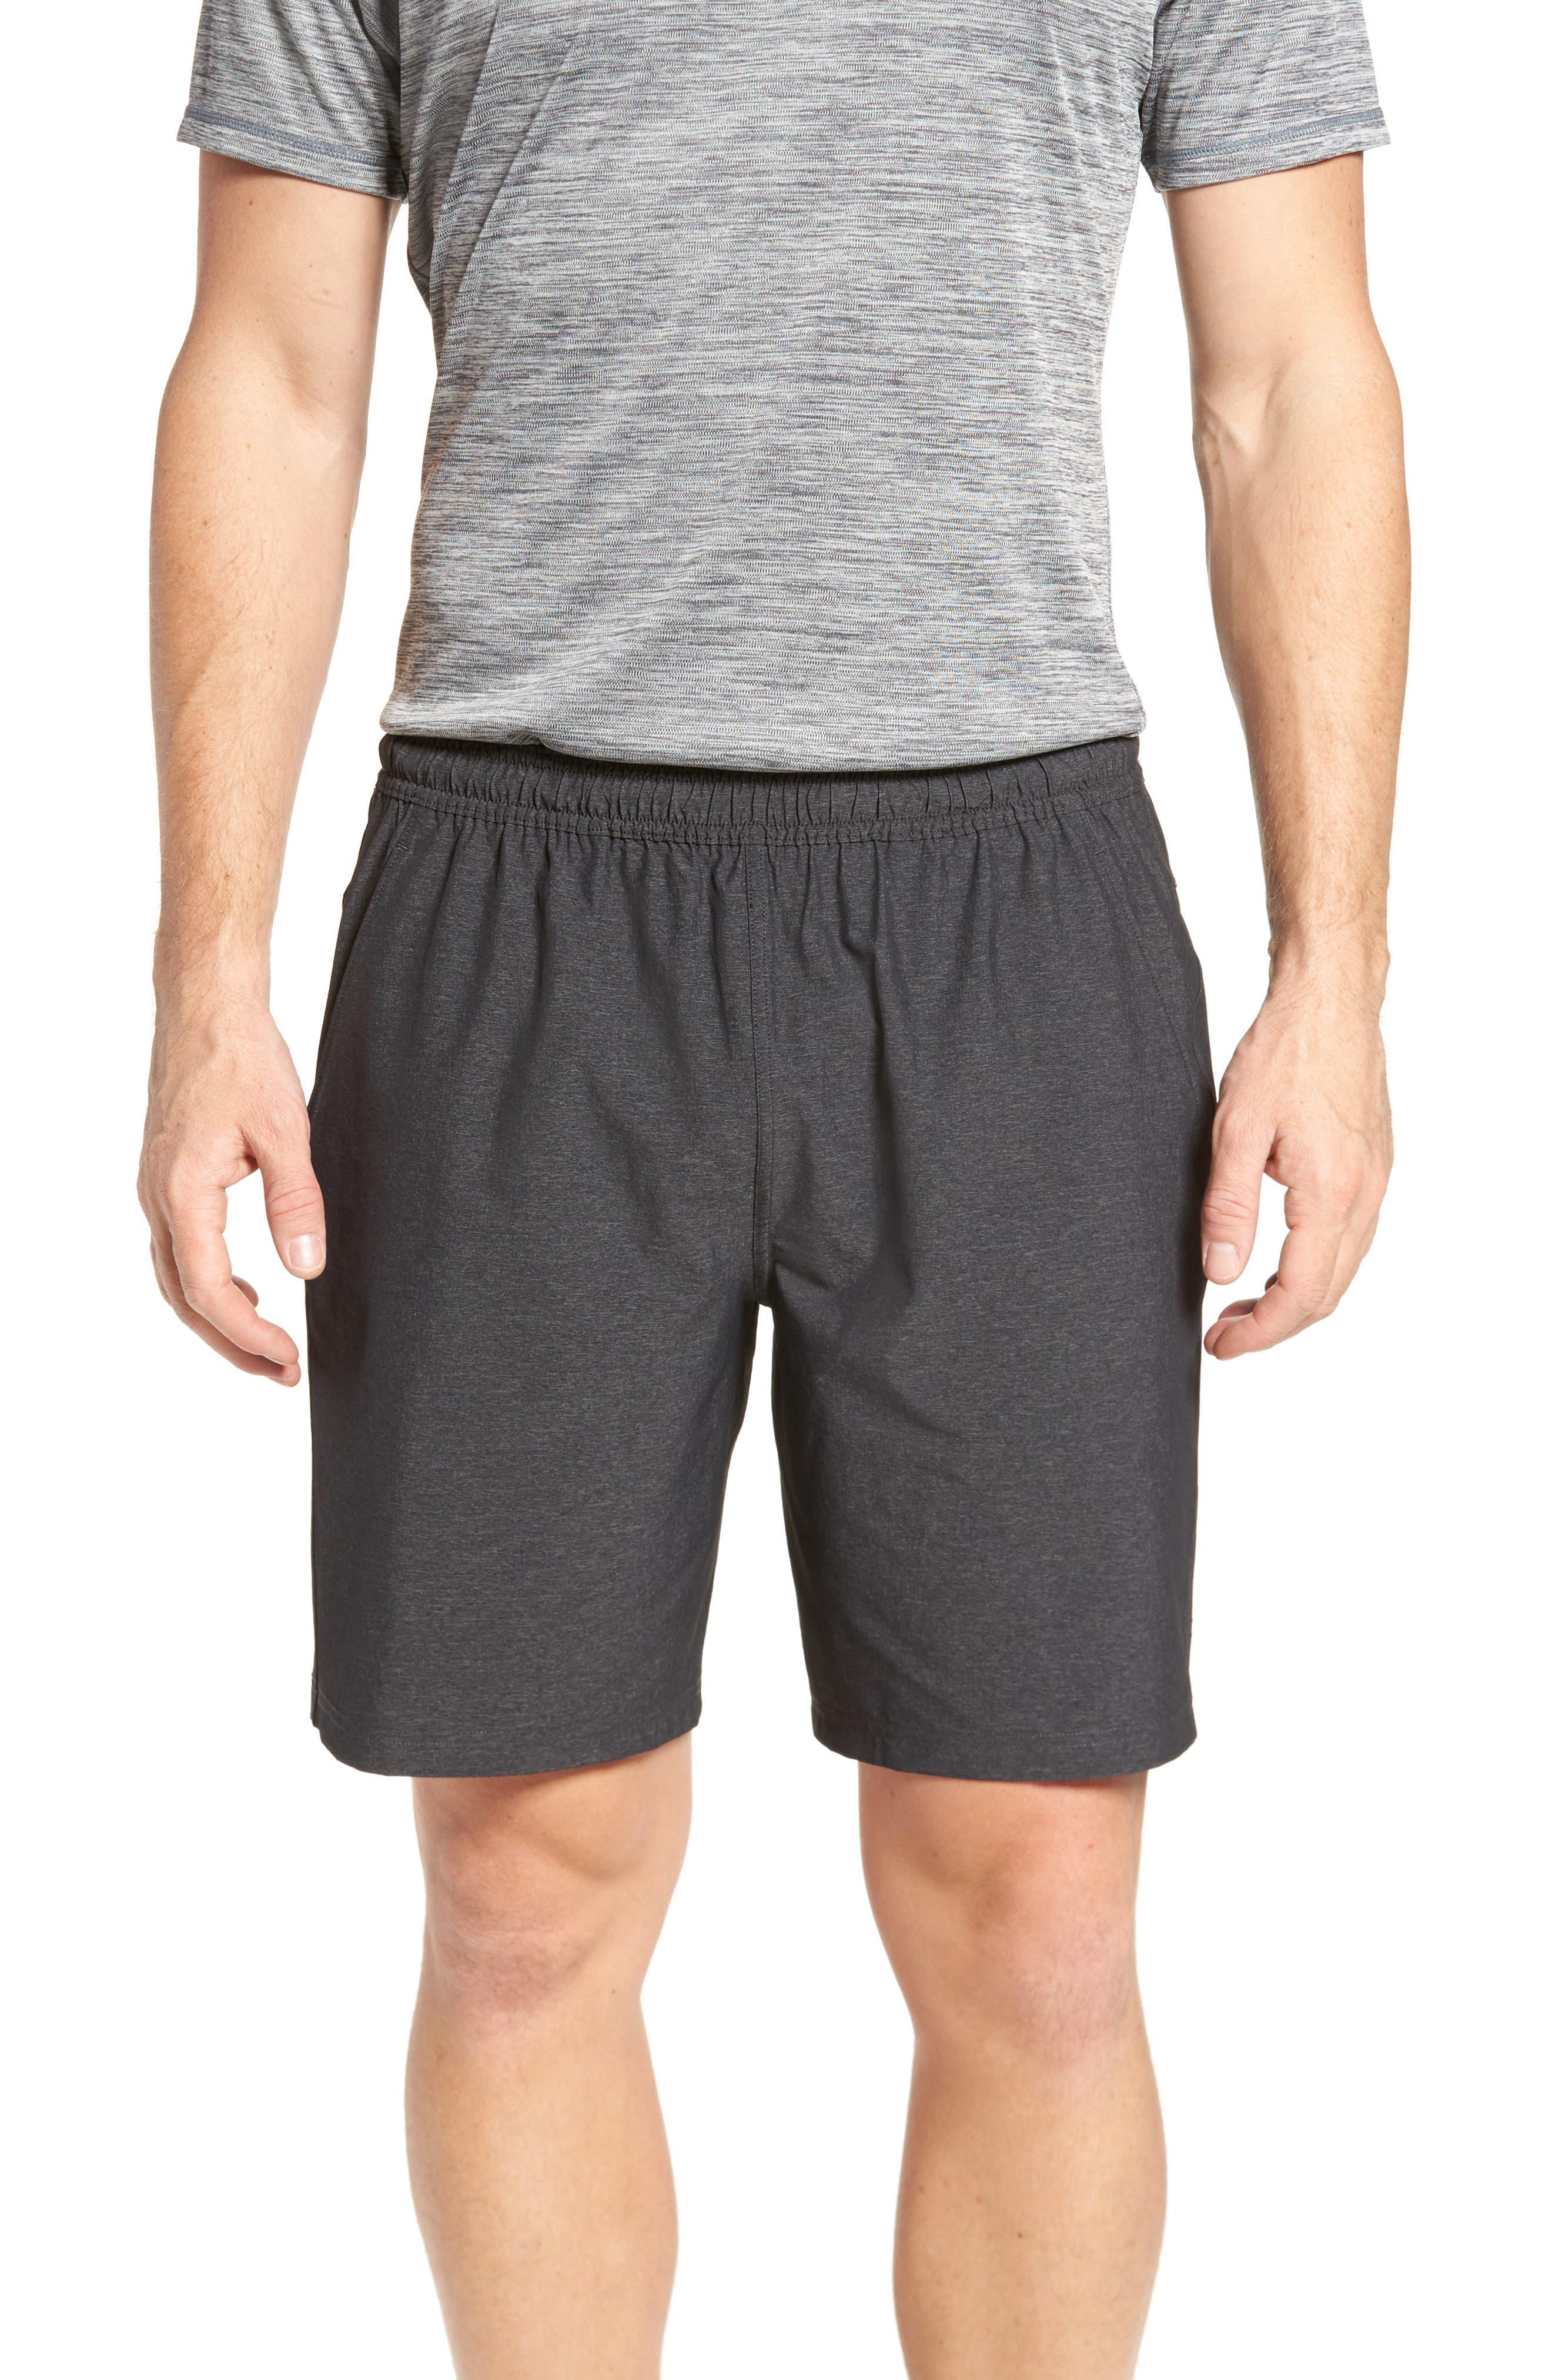 Alternate Image 1 Selected - Zella Graphite Shorts